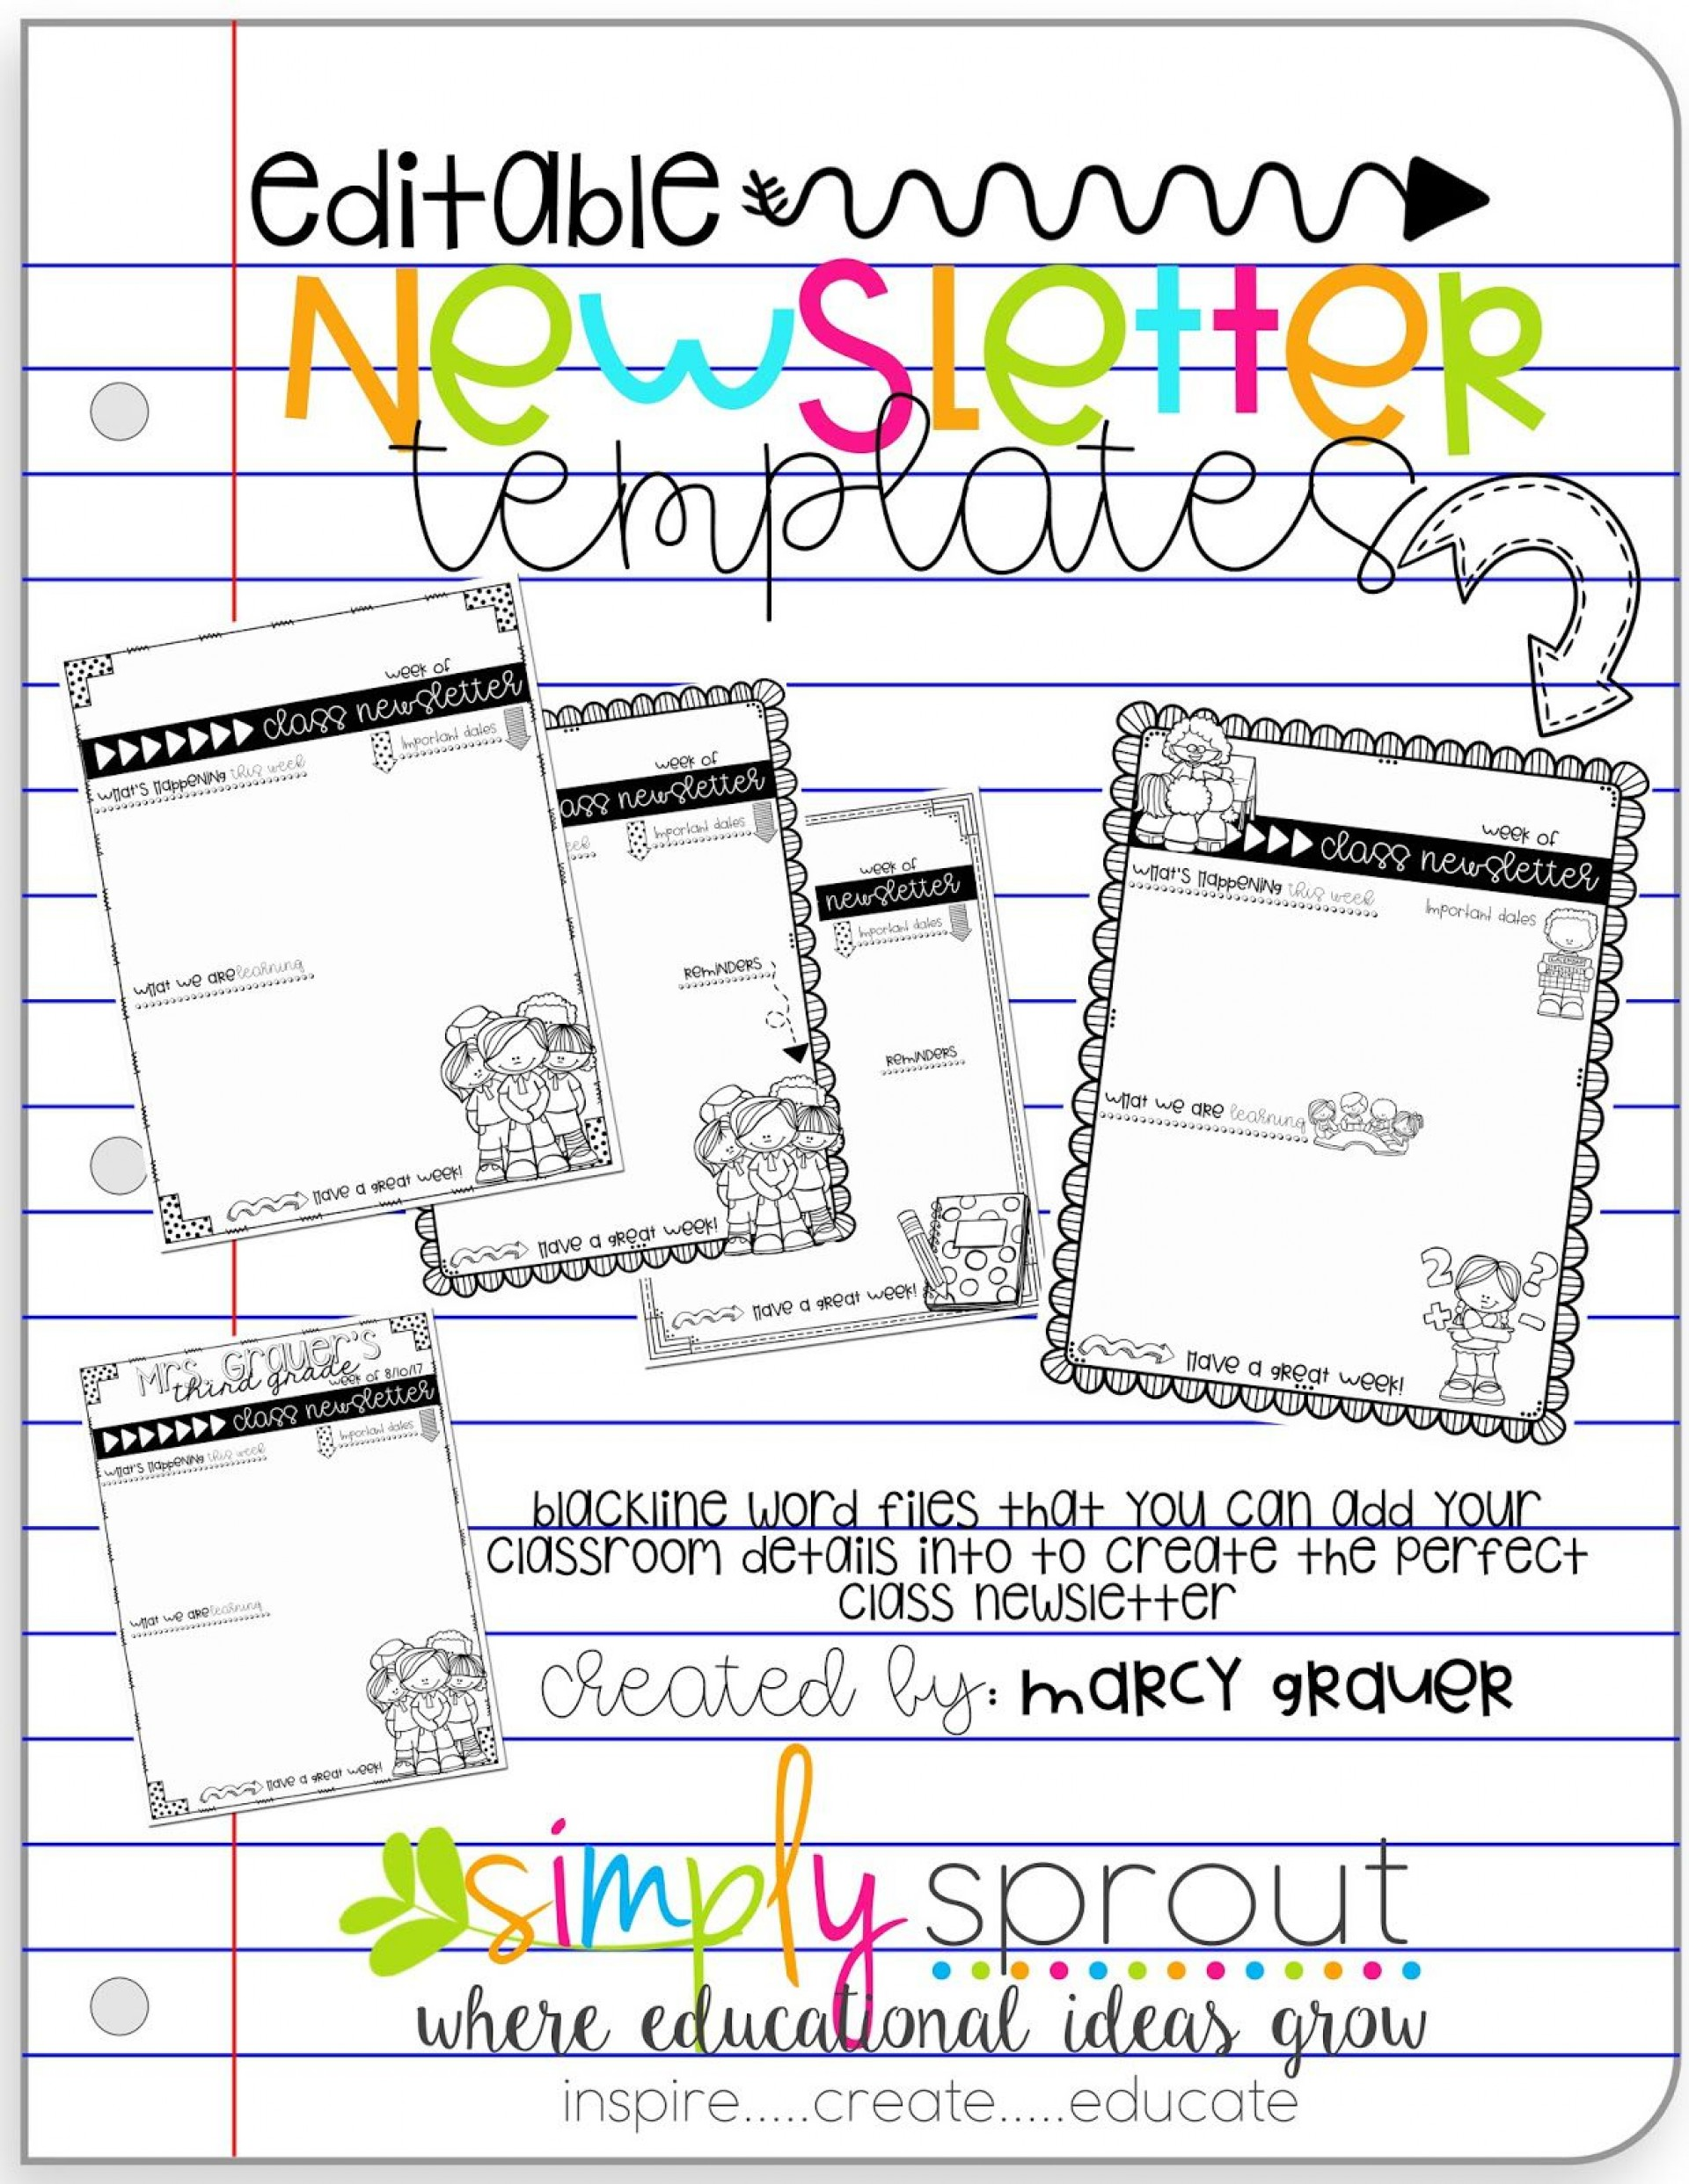 008 Shocking Newsletter Template For Teacher Design  Teachers To Parent Printable Free School1920